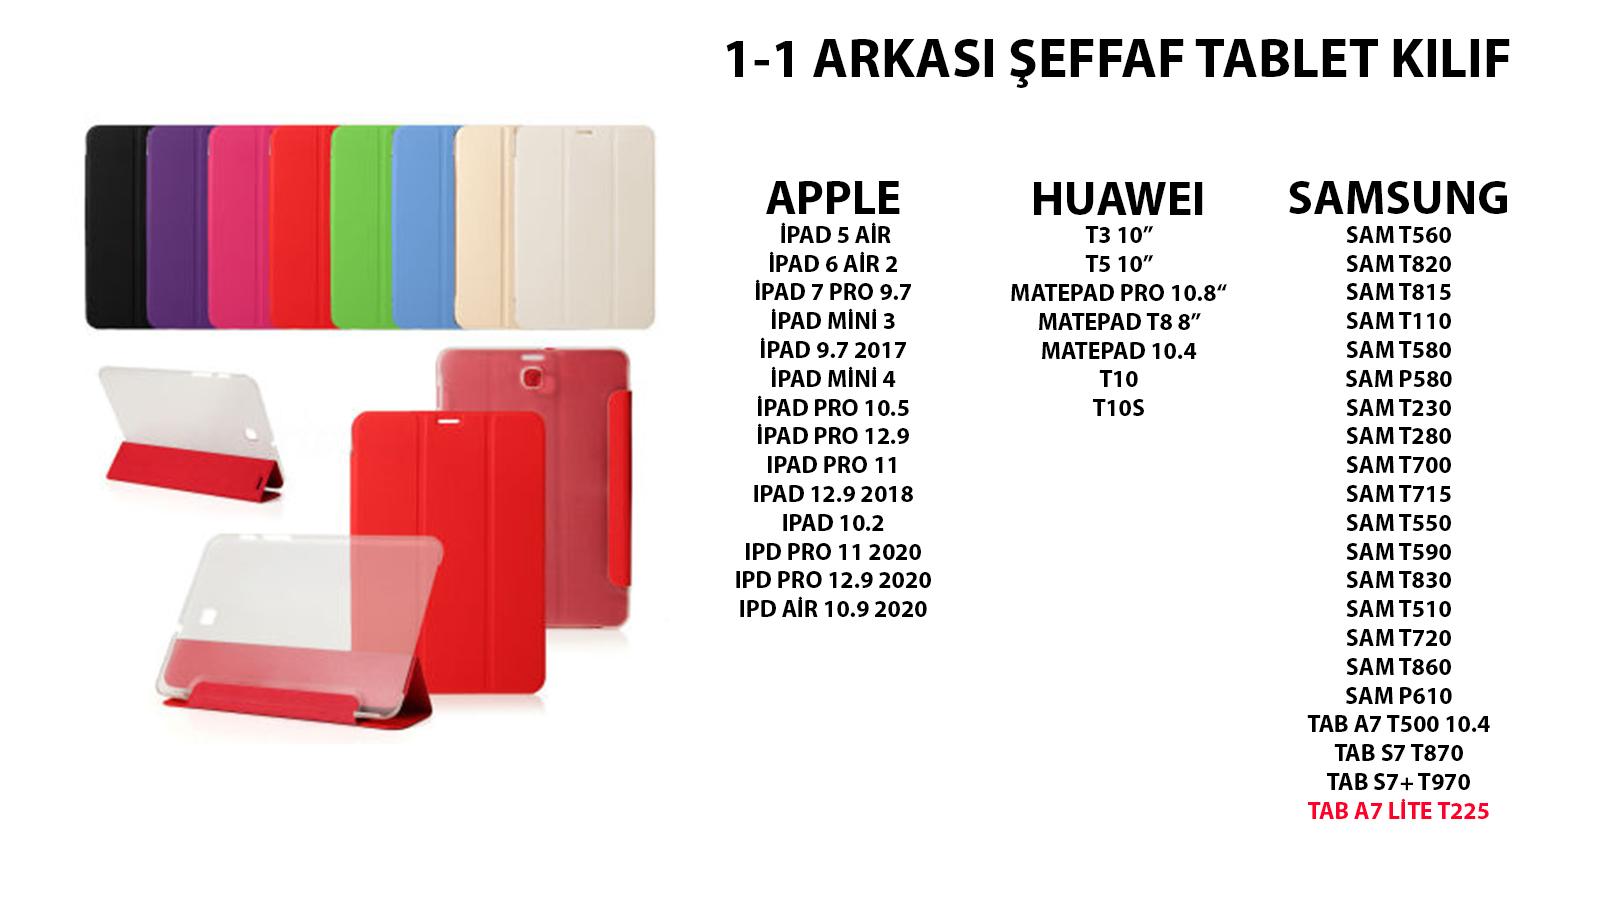 1-1 ARKASI ŞEFFAF KILIF.jpg (368 KB)